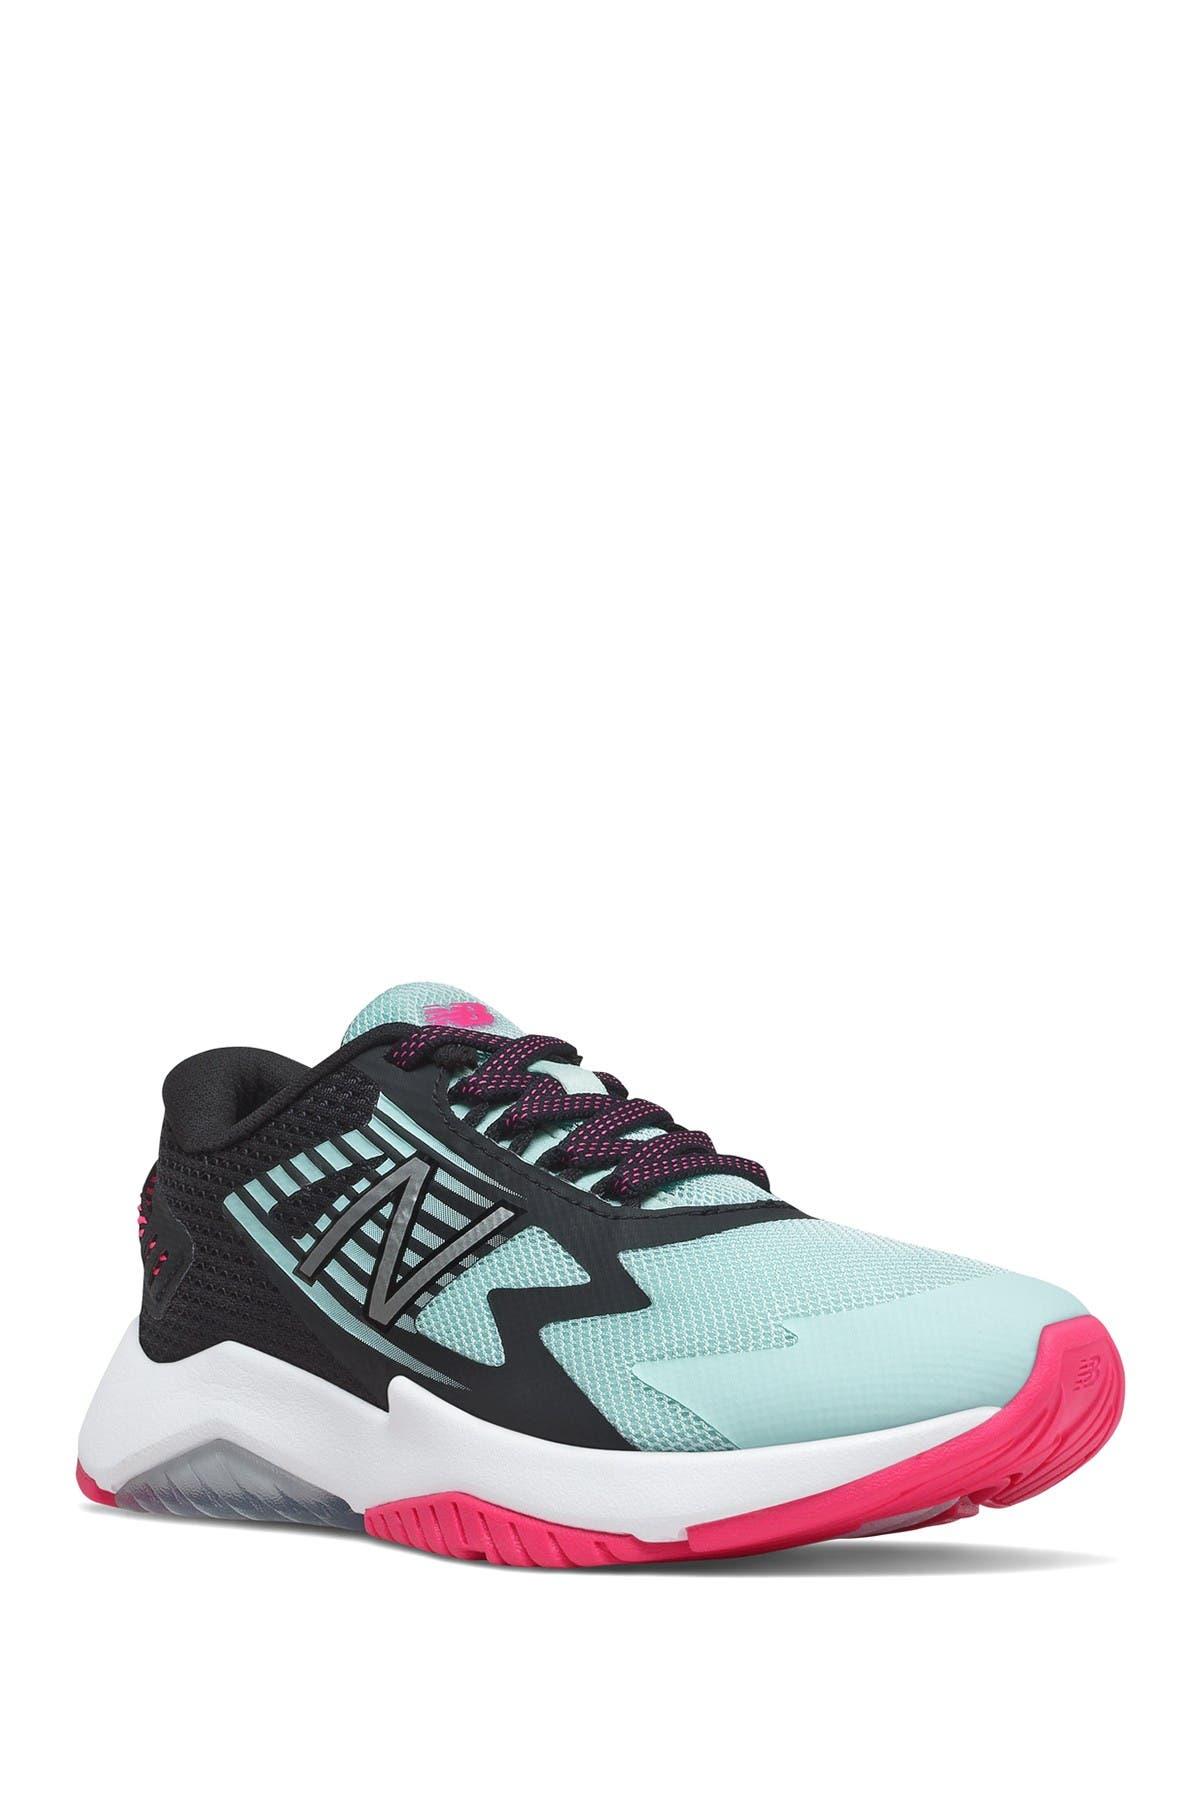 Image of New Balance Rave Run Running Shoe